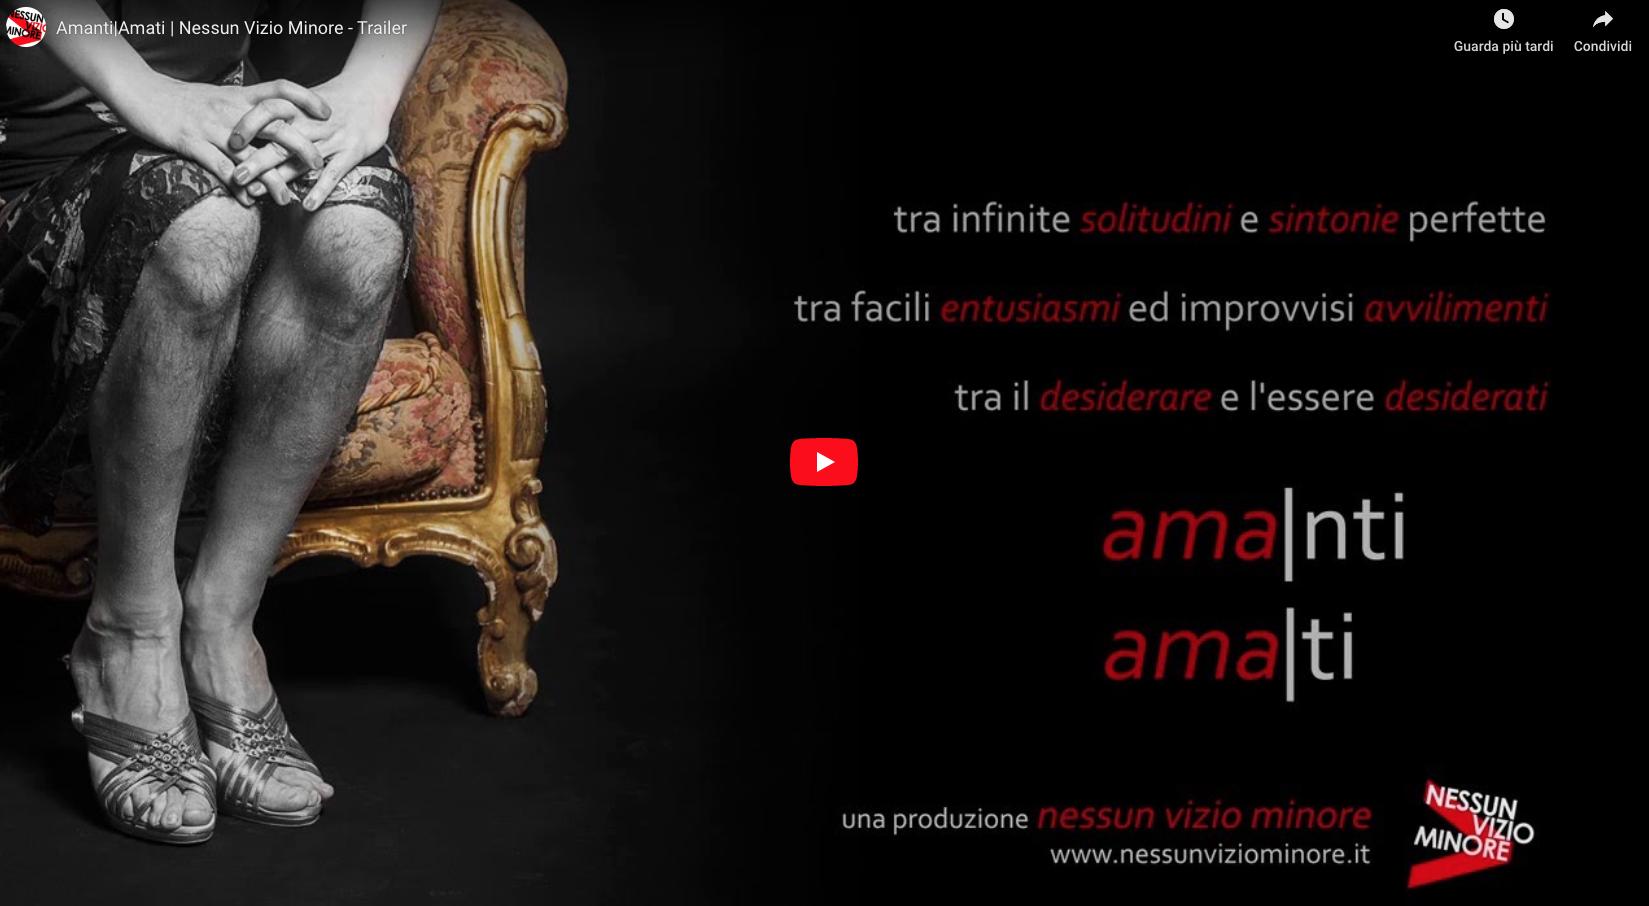 <span>Lifestyle</span>Nessun Vizio Minore – Video Trailer Amanti Amati